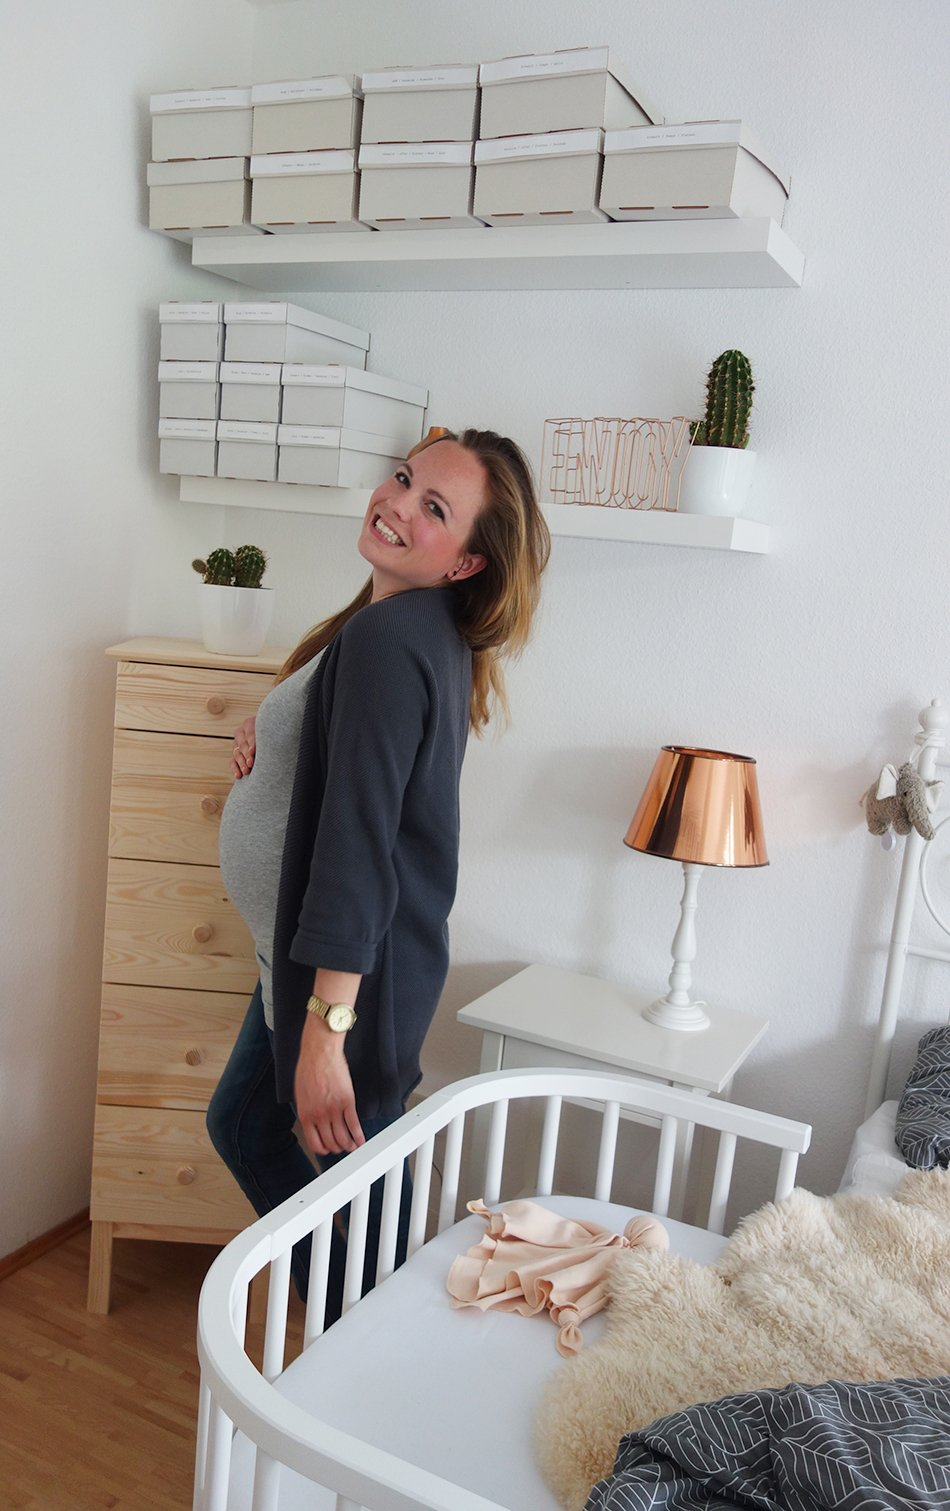 23 wochen schwanger babybett erdbeeren und plazenta ekulele familienleben rezepte mode. Black Bedroom Furniture Sets. Home Design Ideas